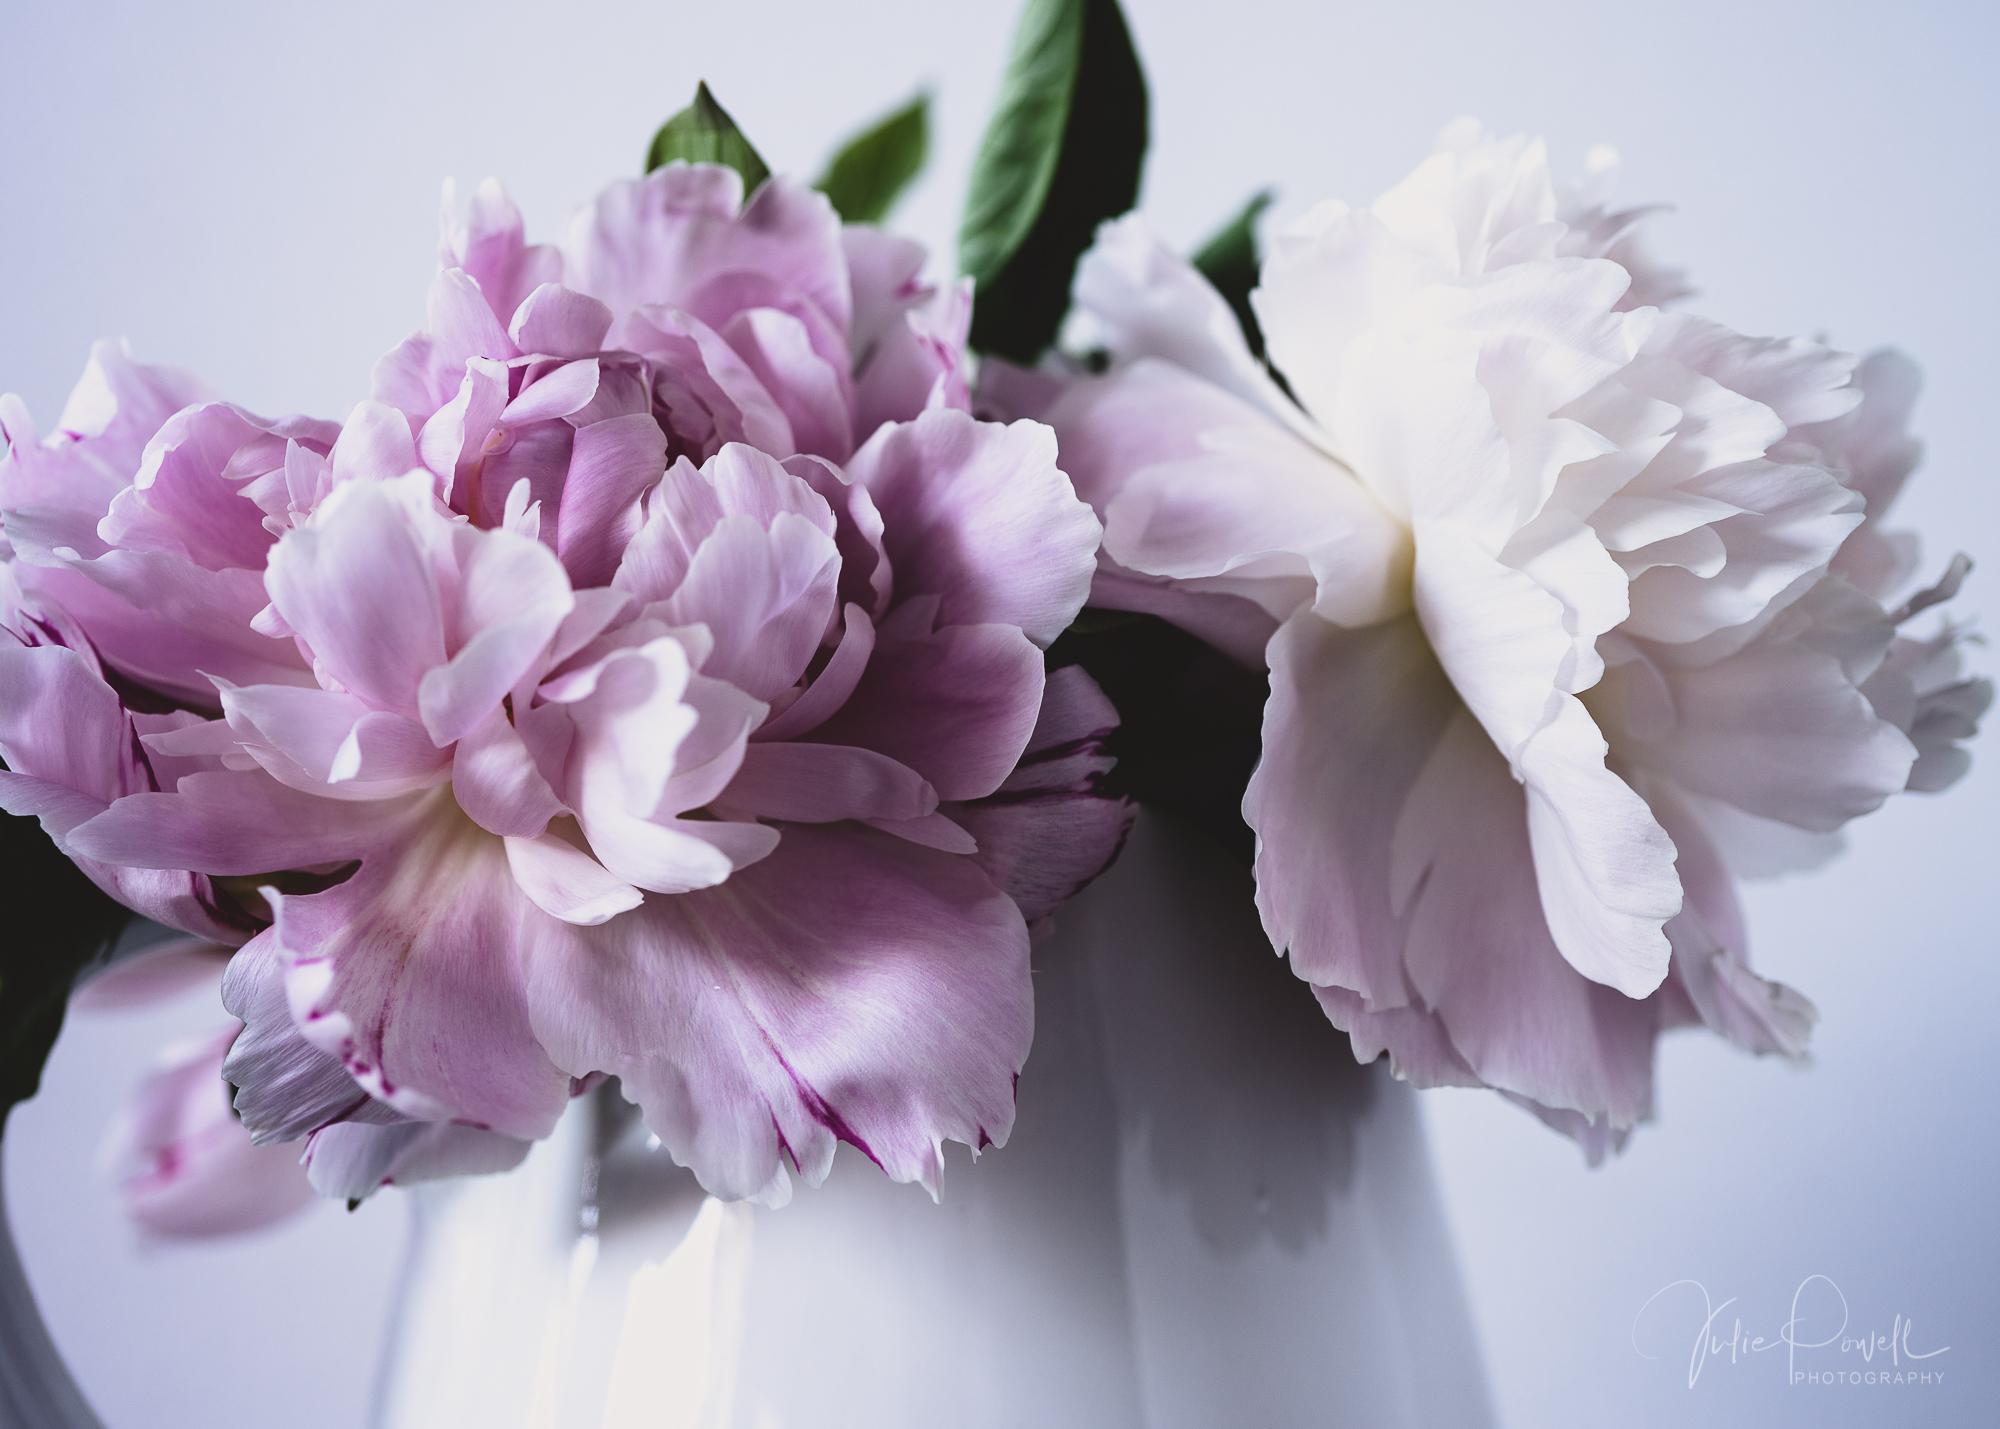 Julie Powell_Peony-8.jpg